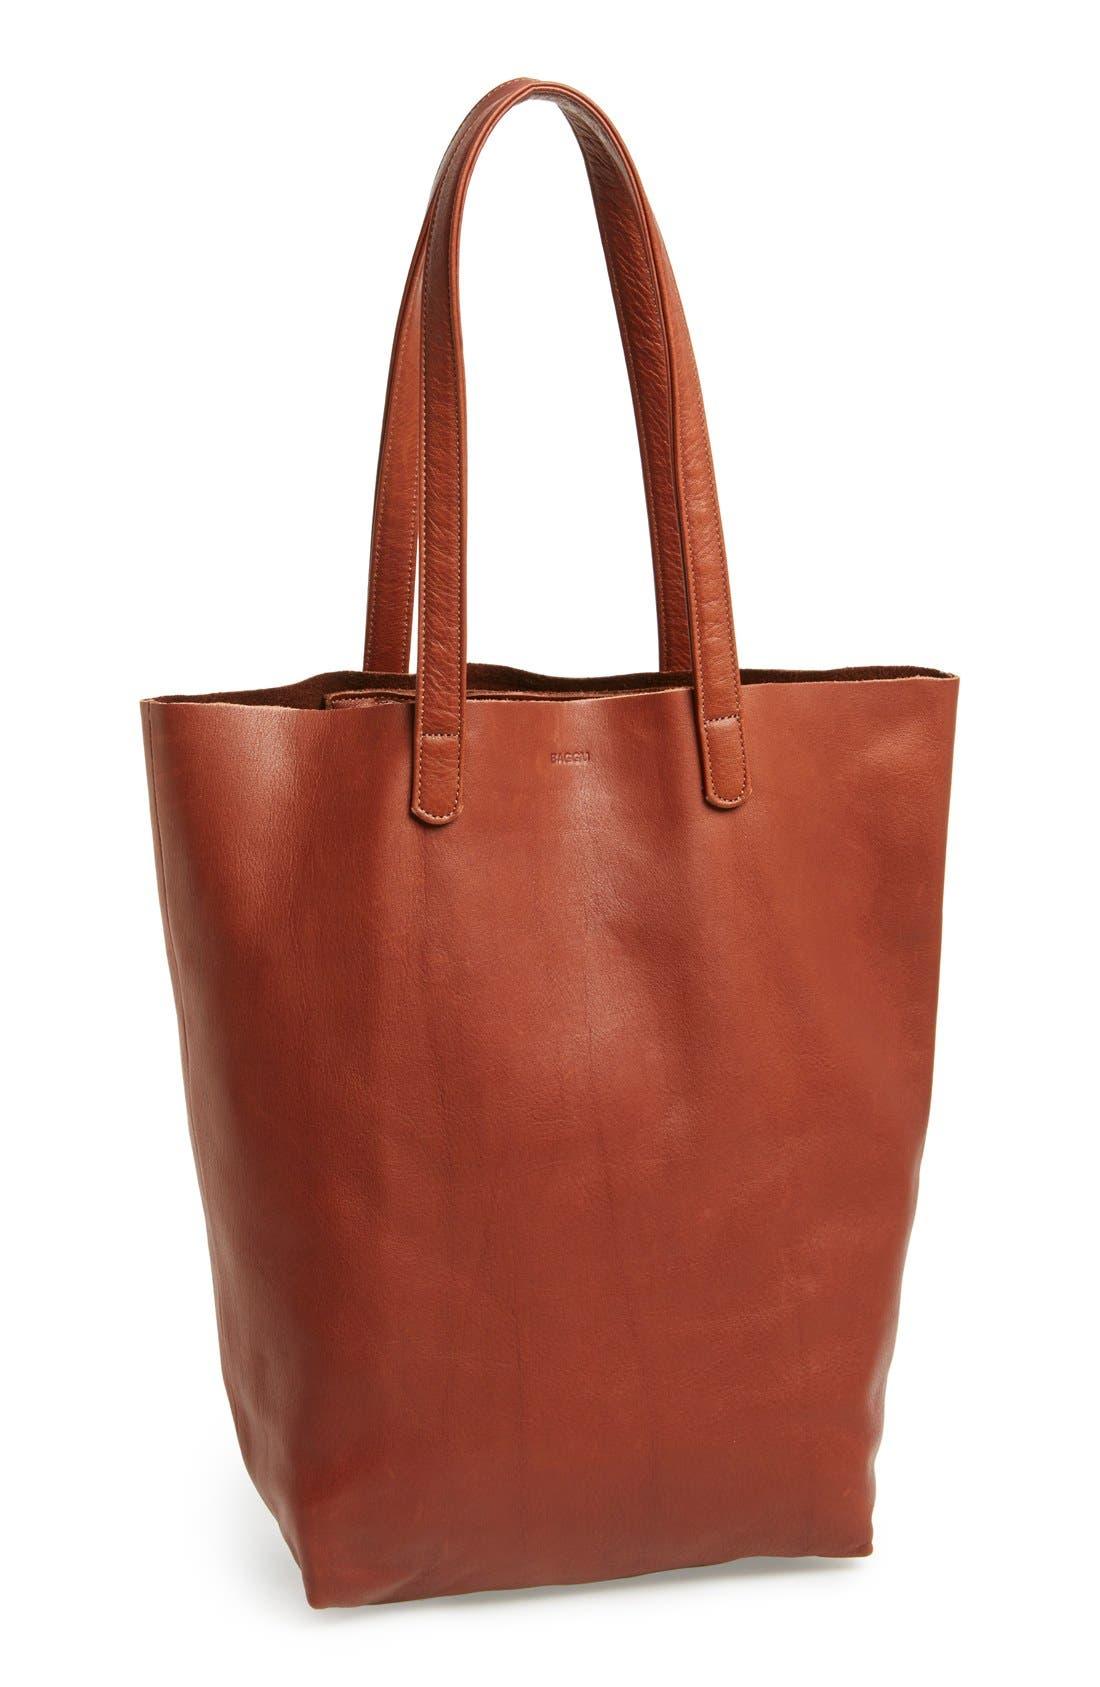 Alternate Image 1 Selected - Baggu® 'Basic' Leather Tote